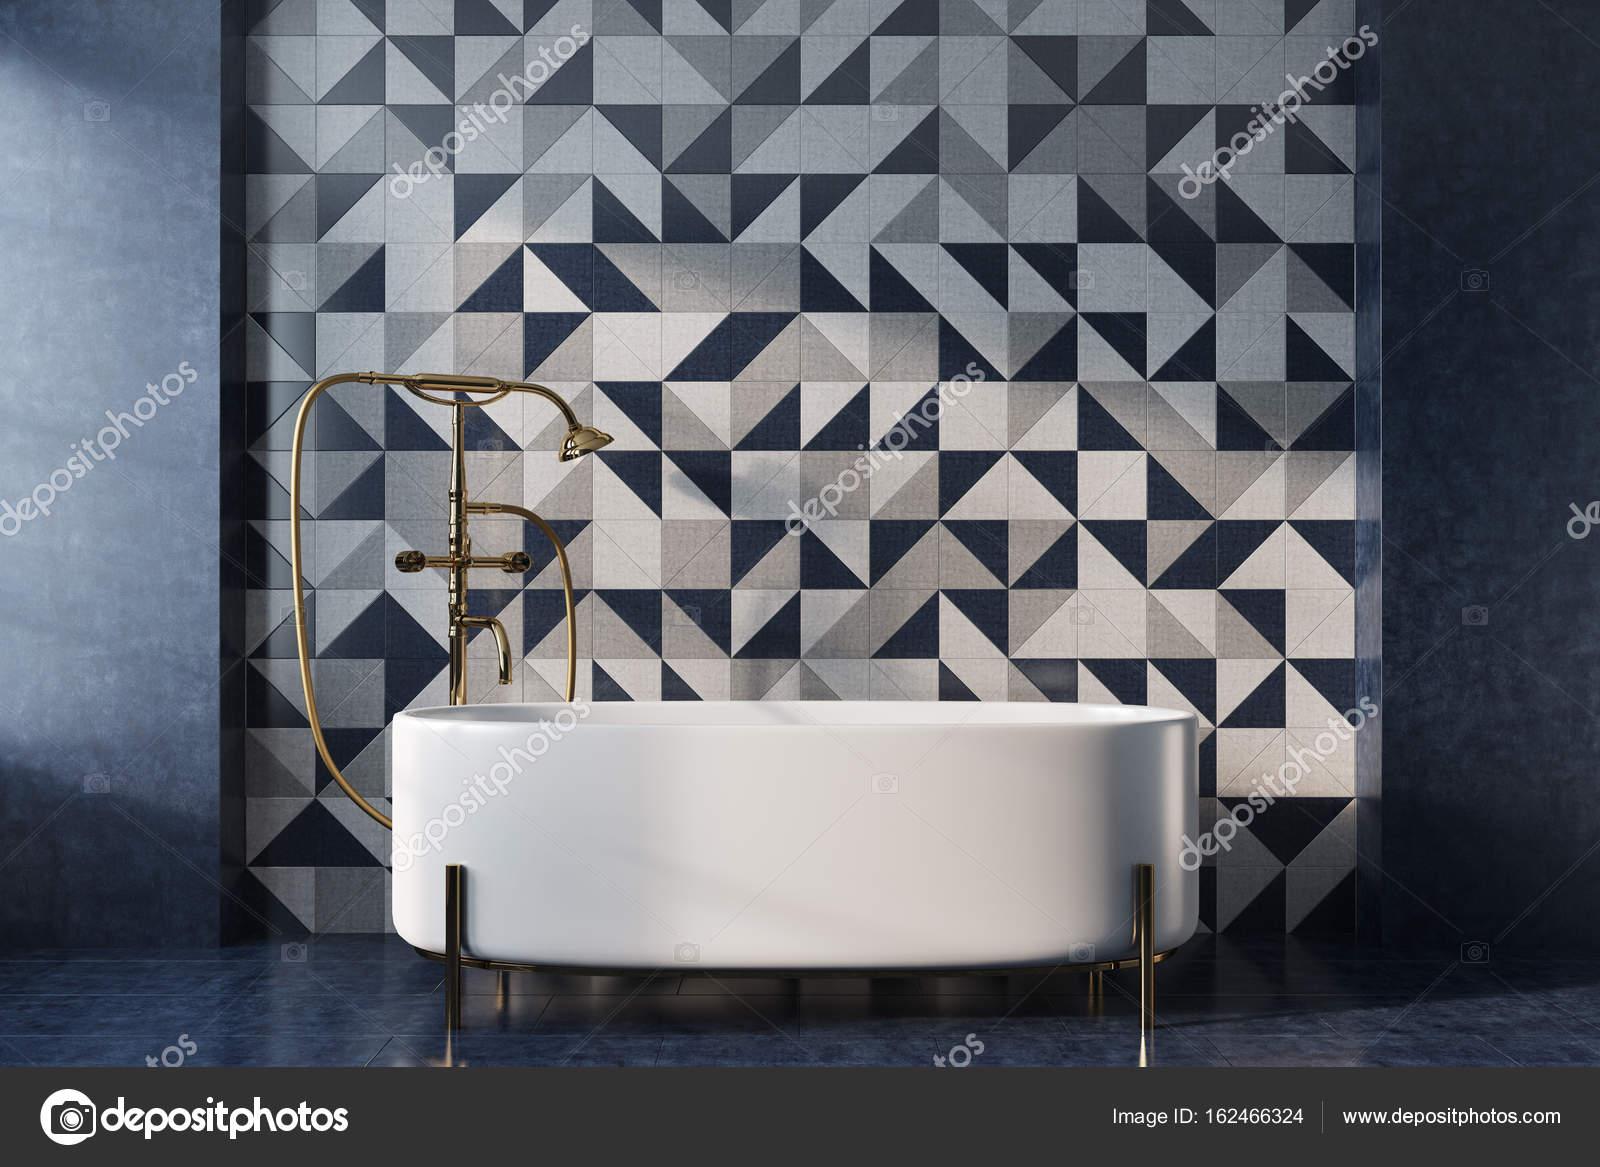 Vasca da bagno mosaico bianco u foto stock denisismagilov